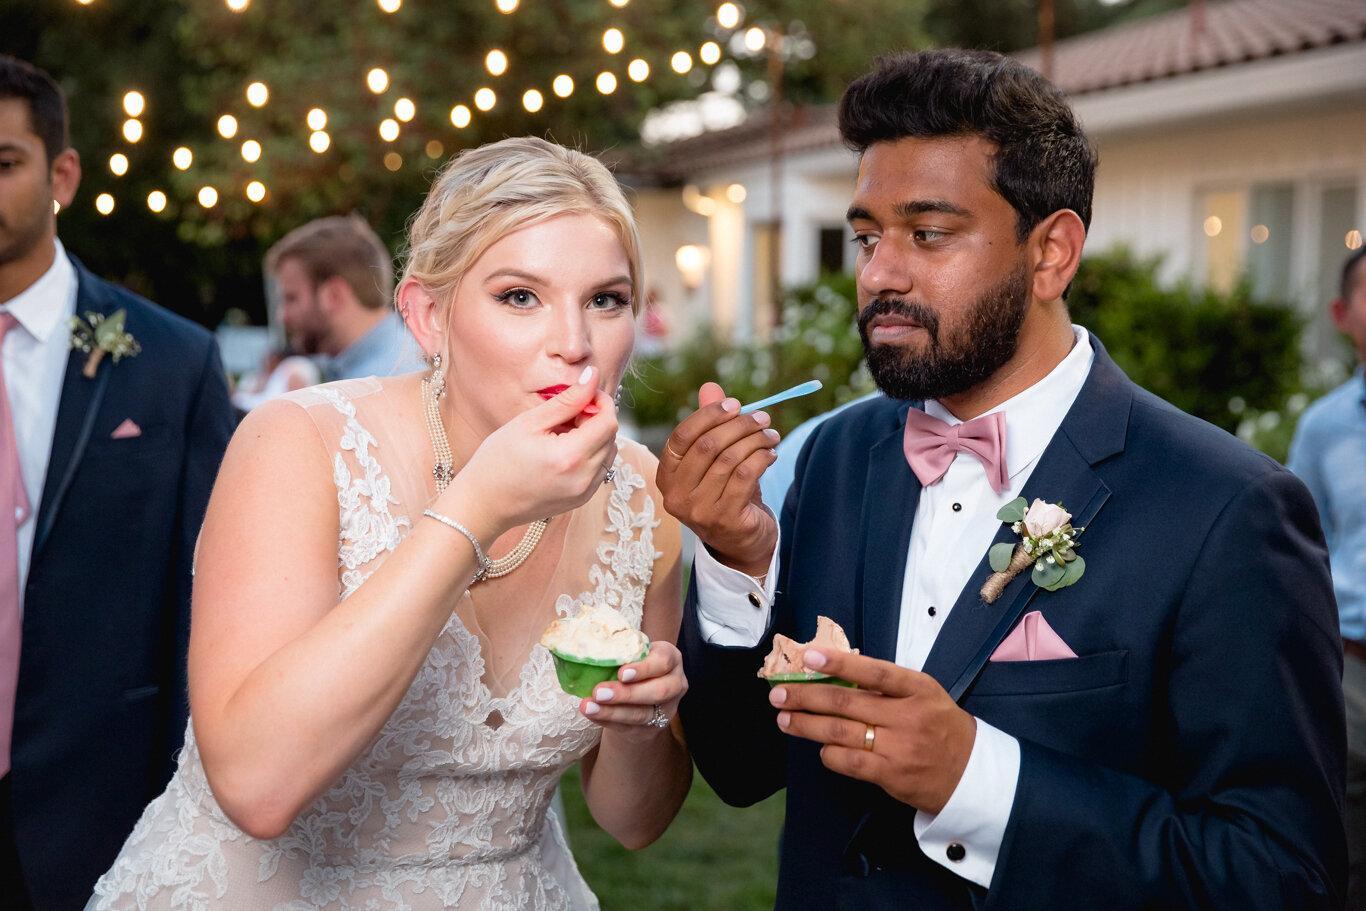 2019.08.24_Emily-Ashir-Wedding-at-the-Maples-6351.jpg